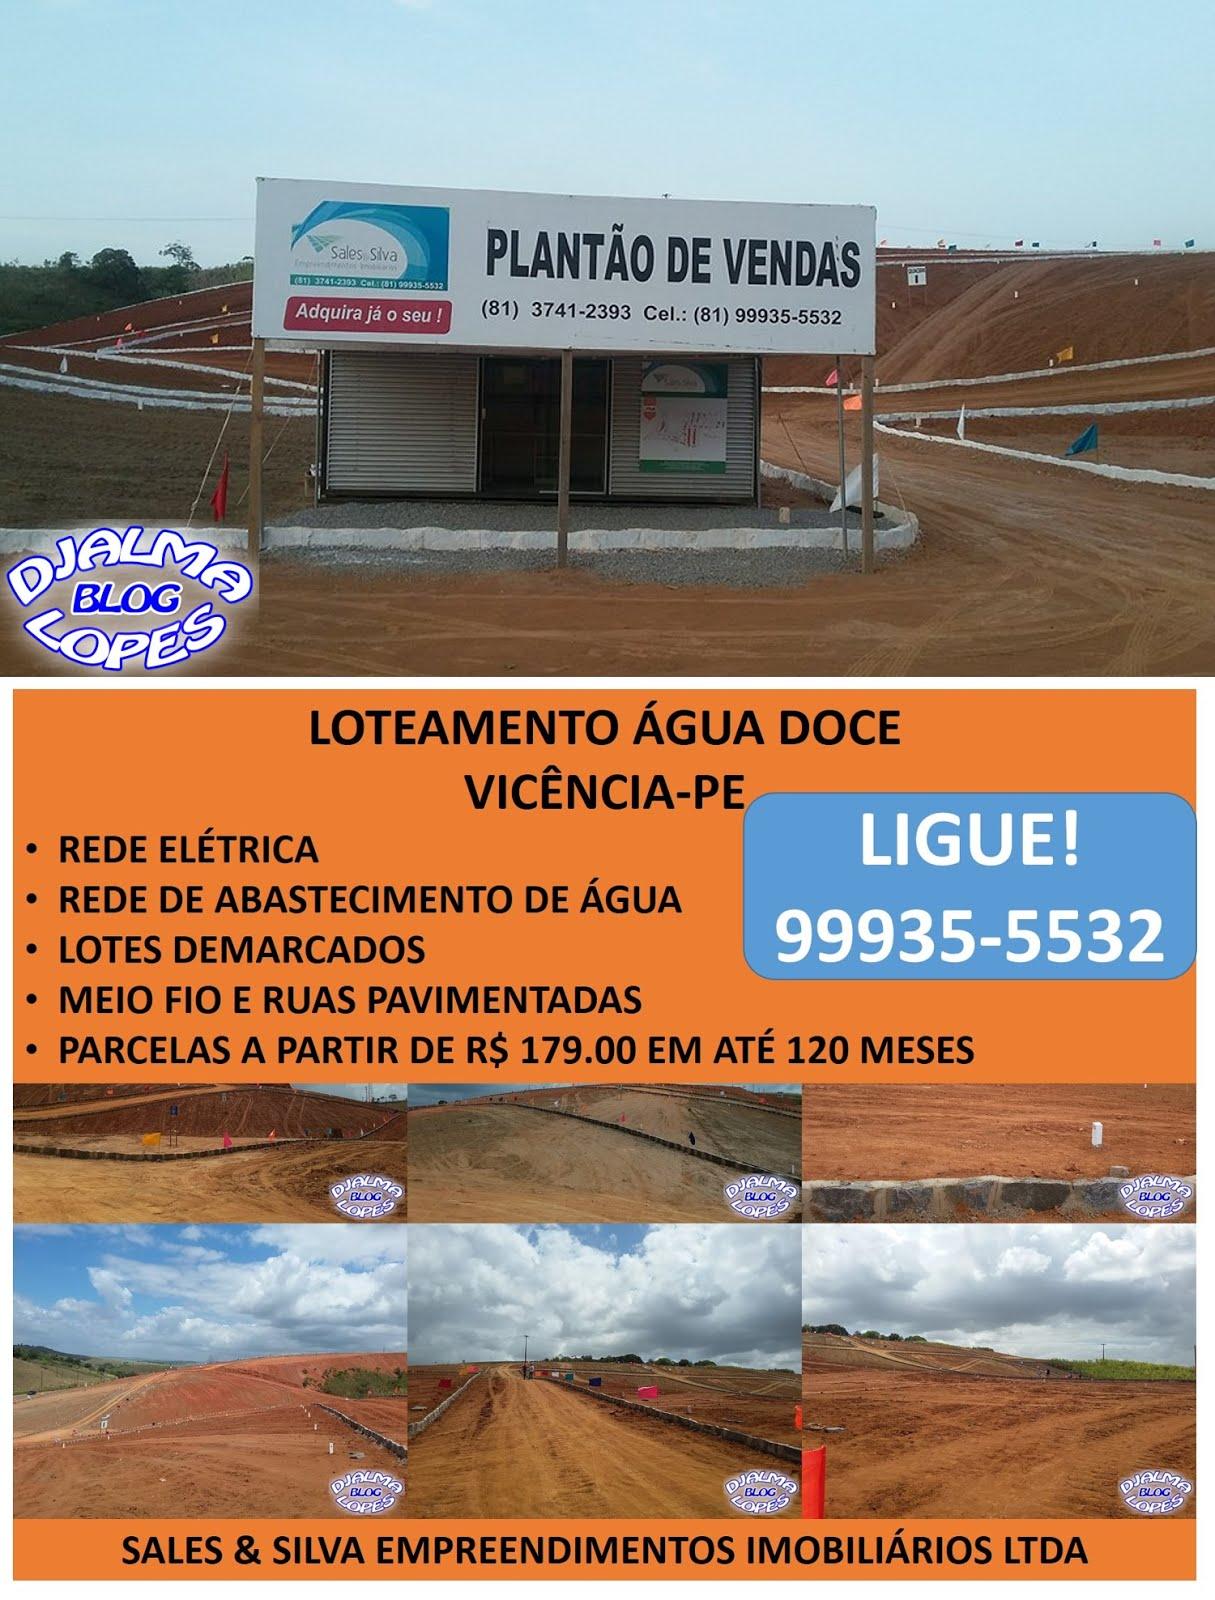 LOTEAMENTO ÁGUA DOCE - VICÊNCIA-PE